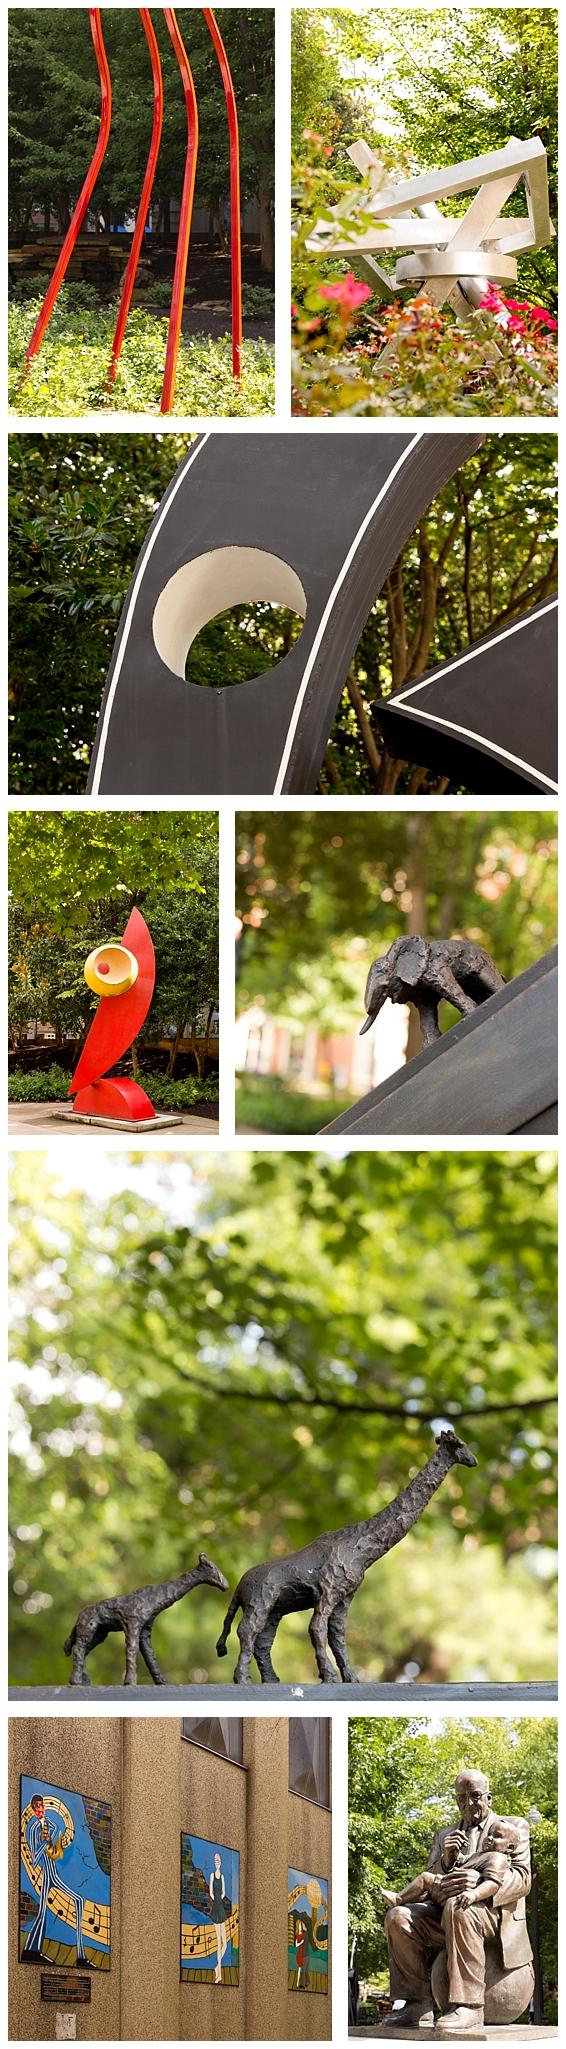 sculpture garden in Knoxville, Tennessee